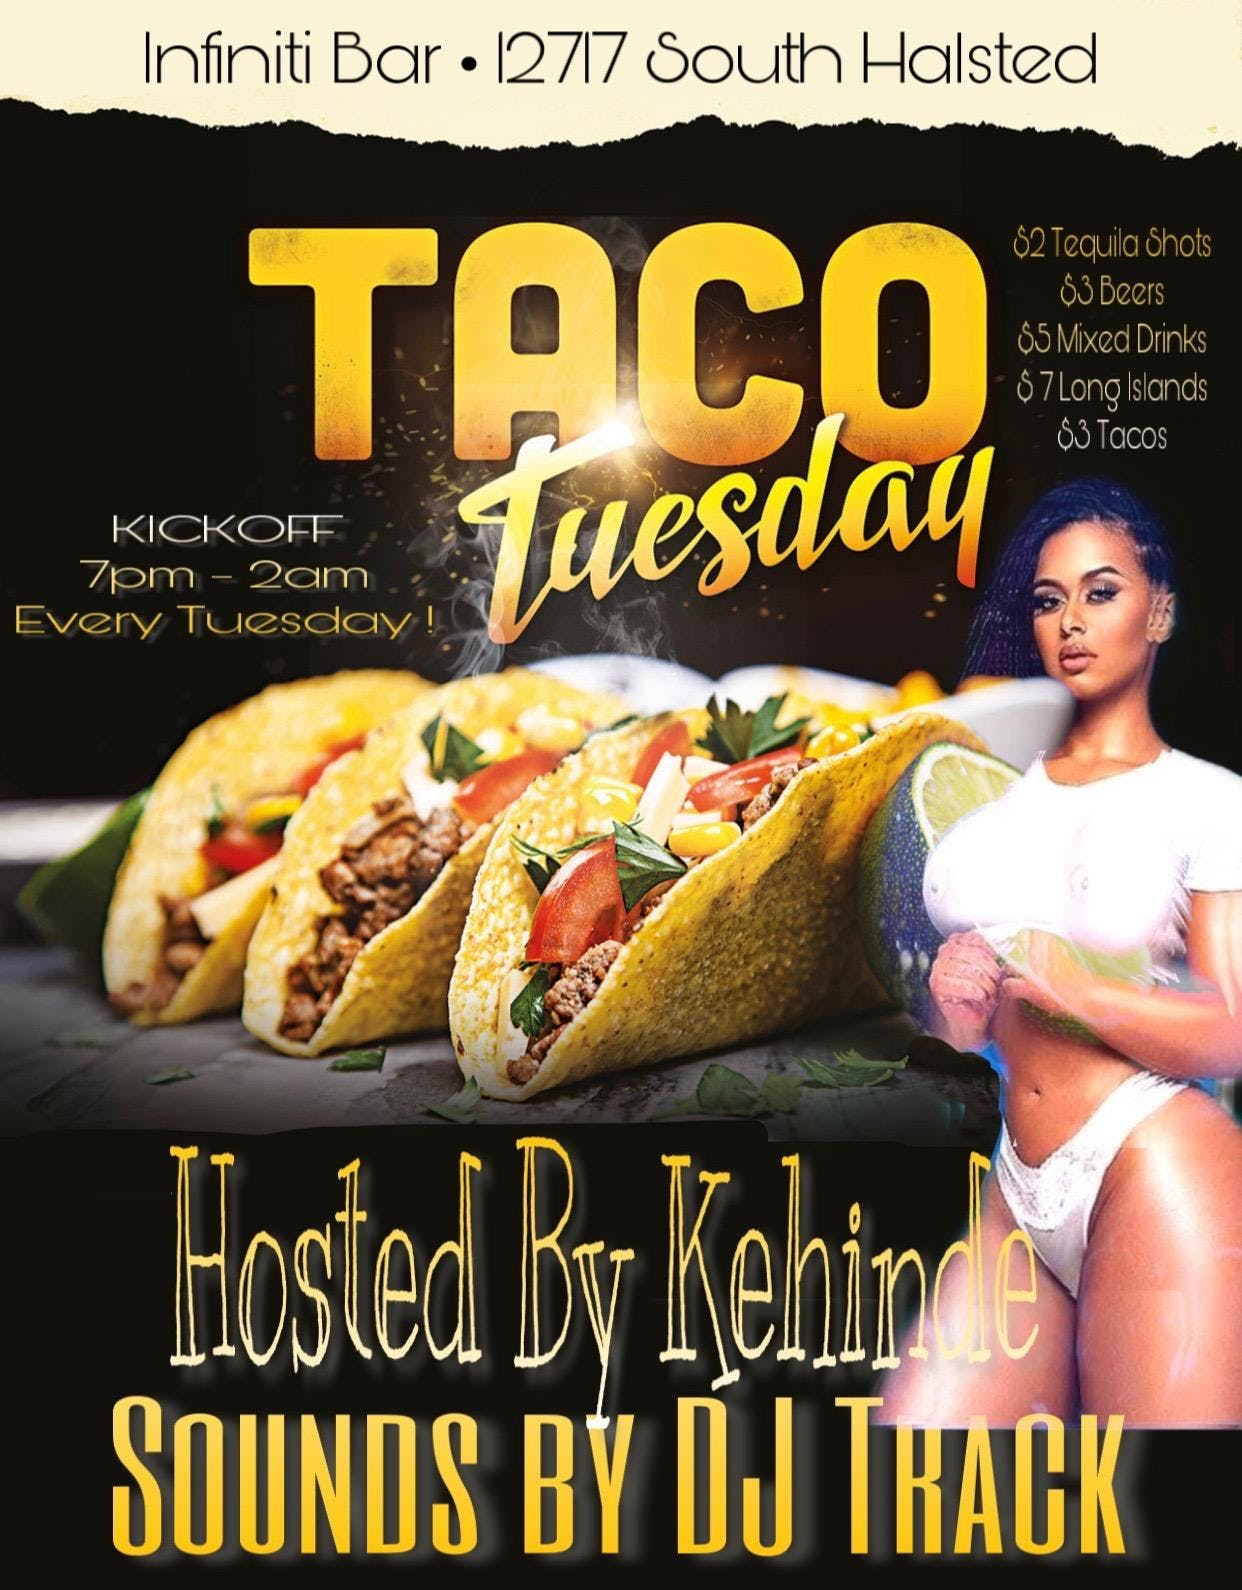 Taco Tuesday's At The Infiniti Bar